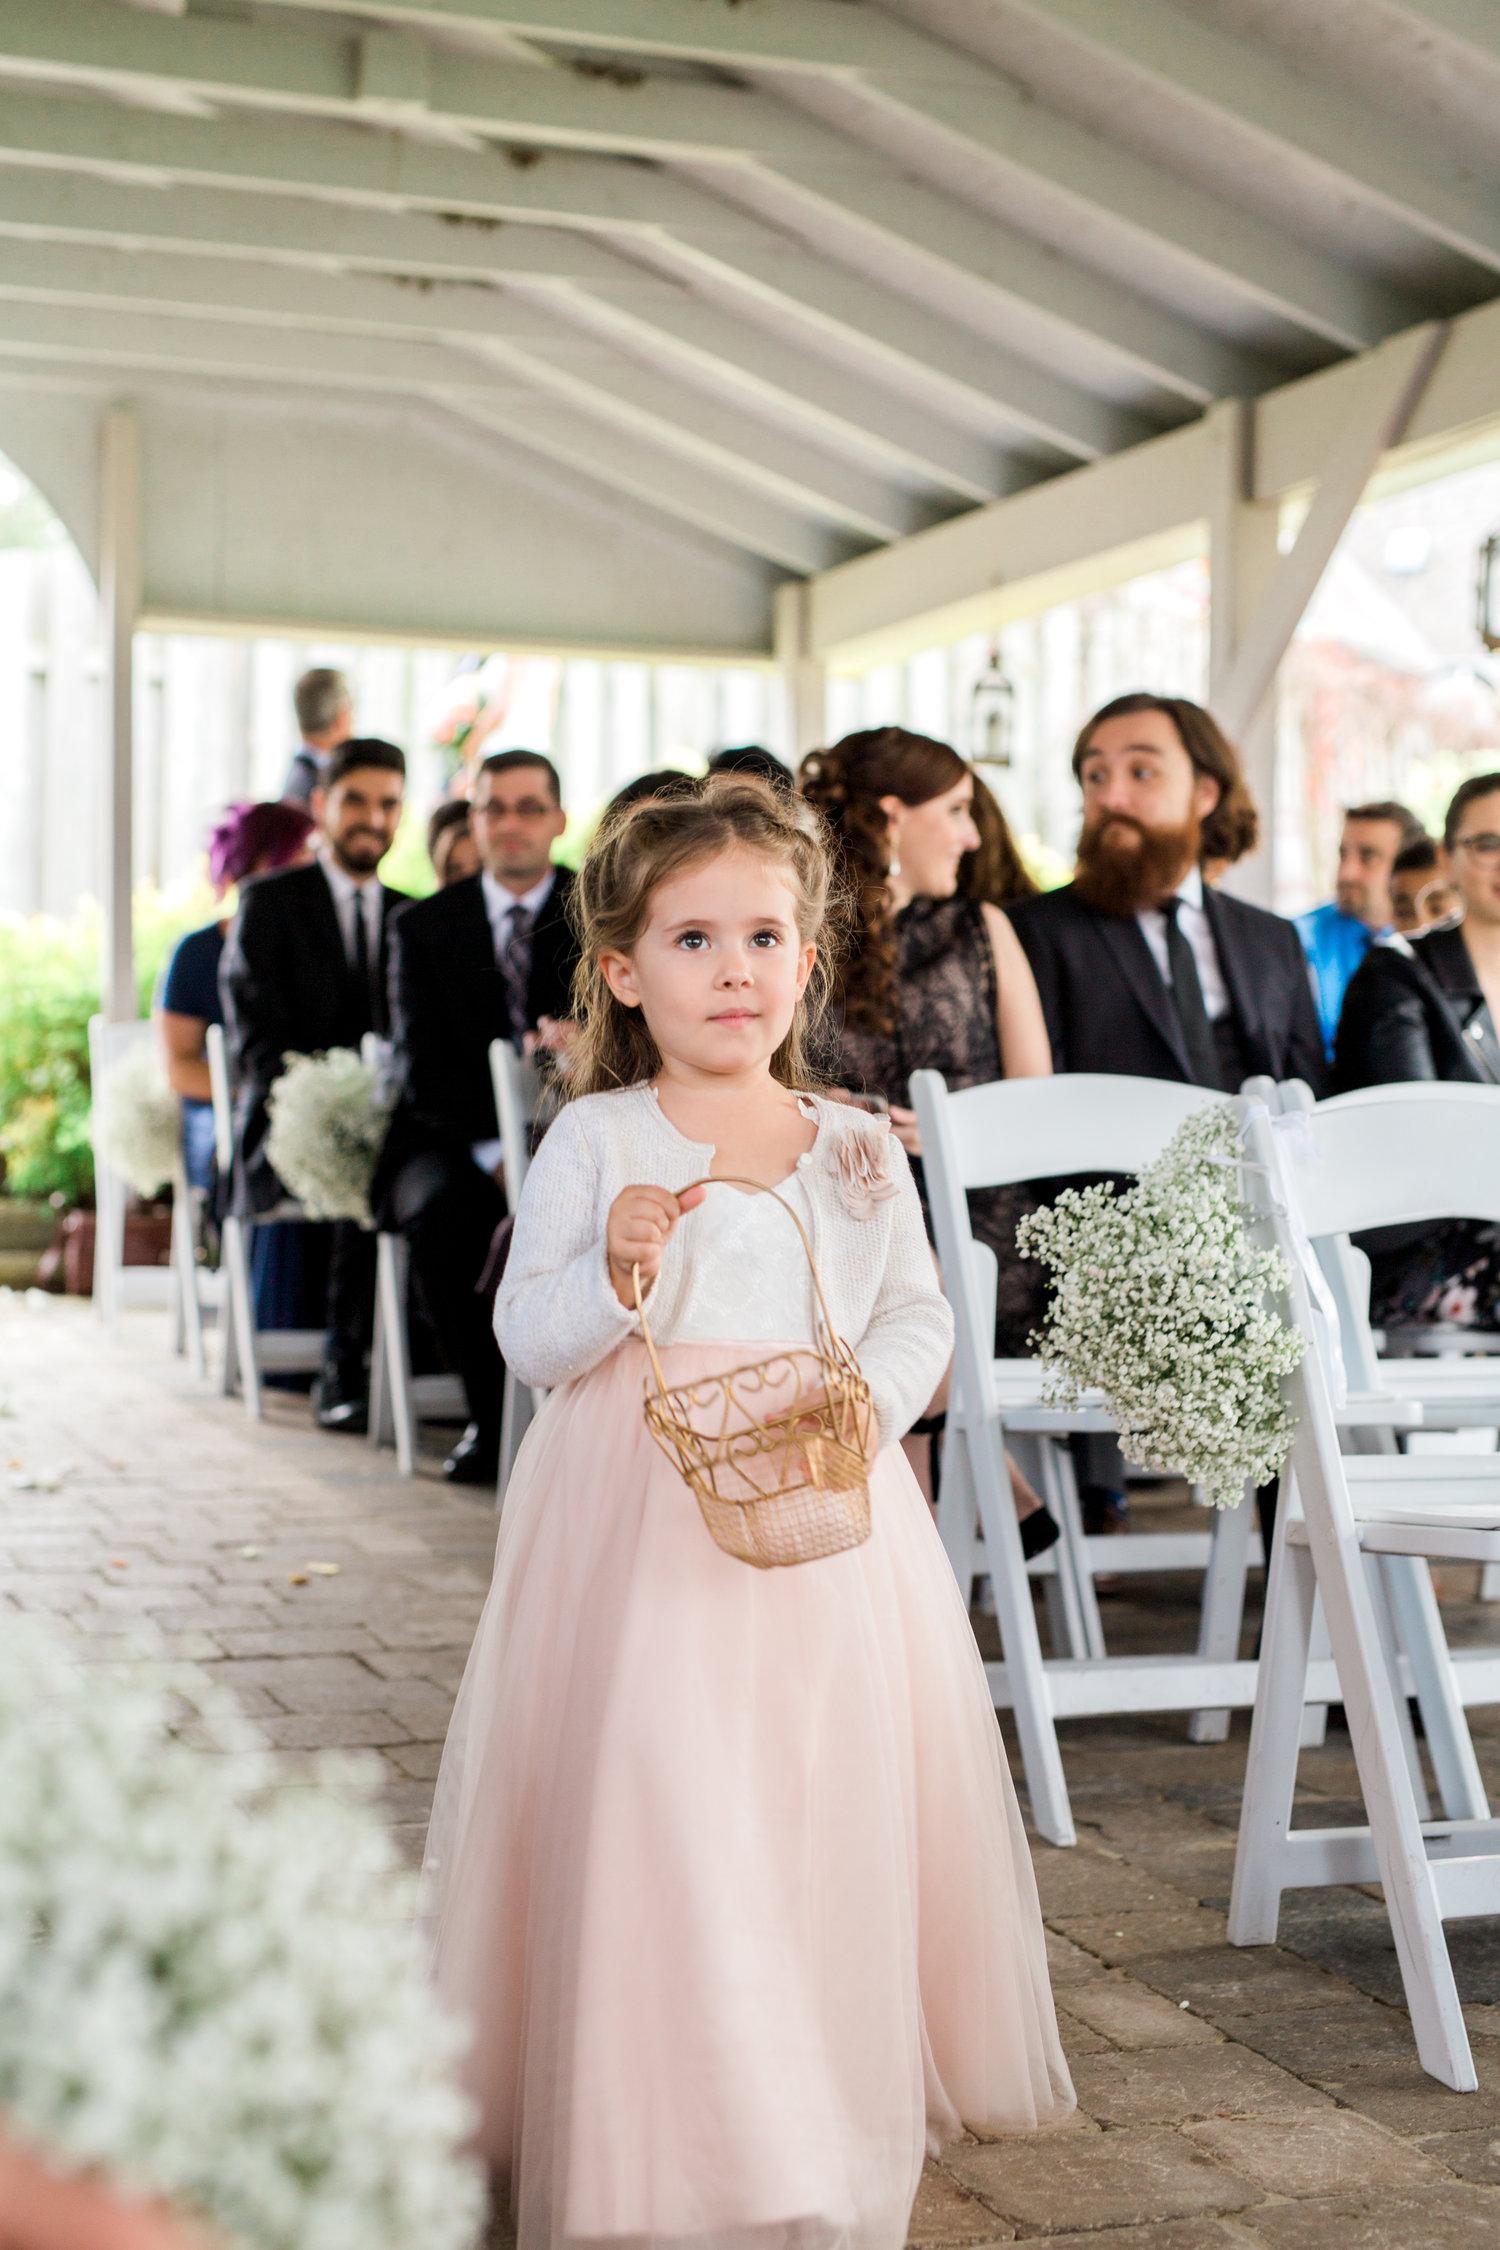 Amir-Golbazi-Danielle-Giroux-Photography_Toronto-Wedding_Cedarwood_Rachel-Paul_164.jpg